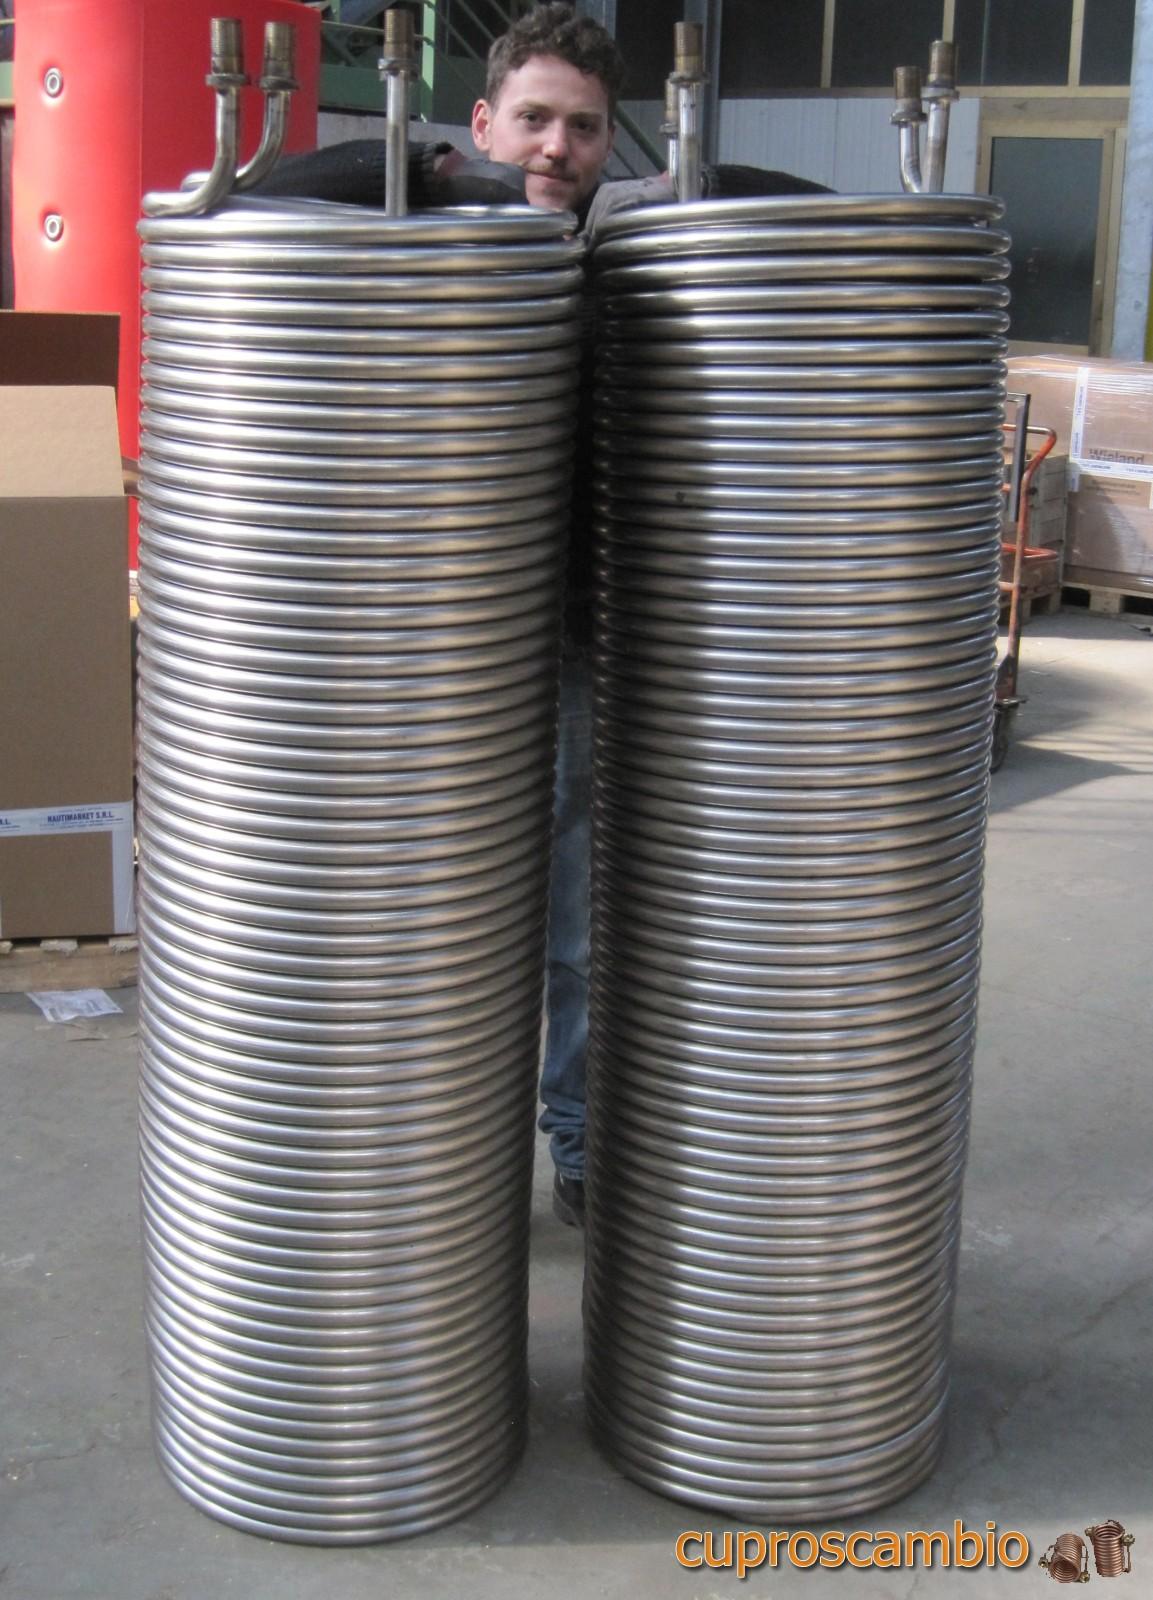 1.4 serpentina di acciaio inox (1)